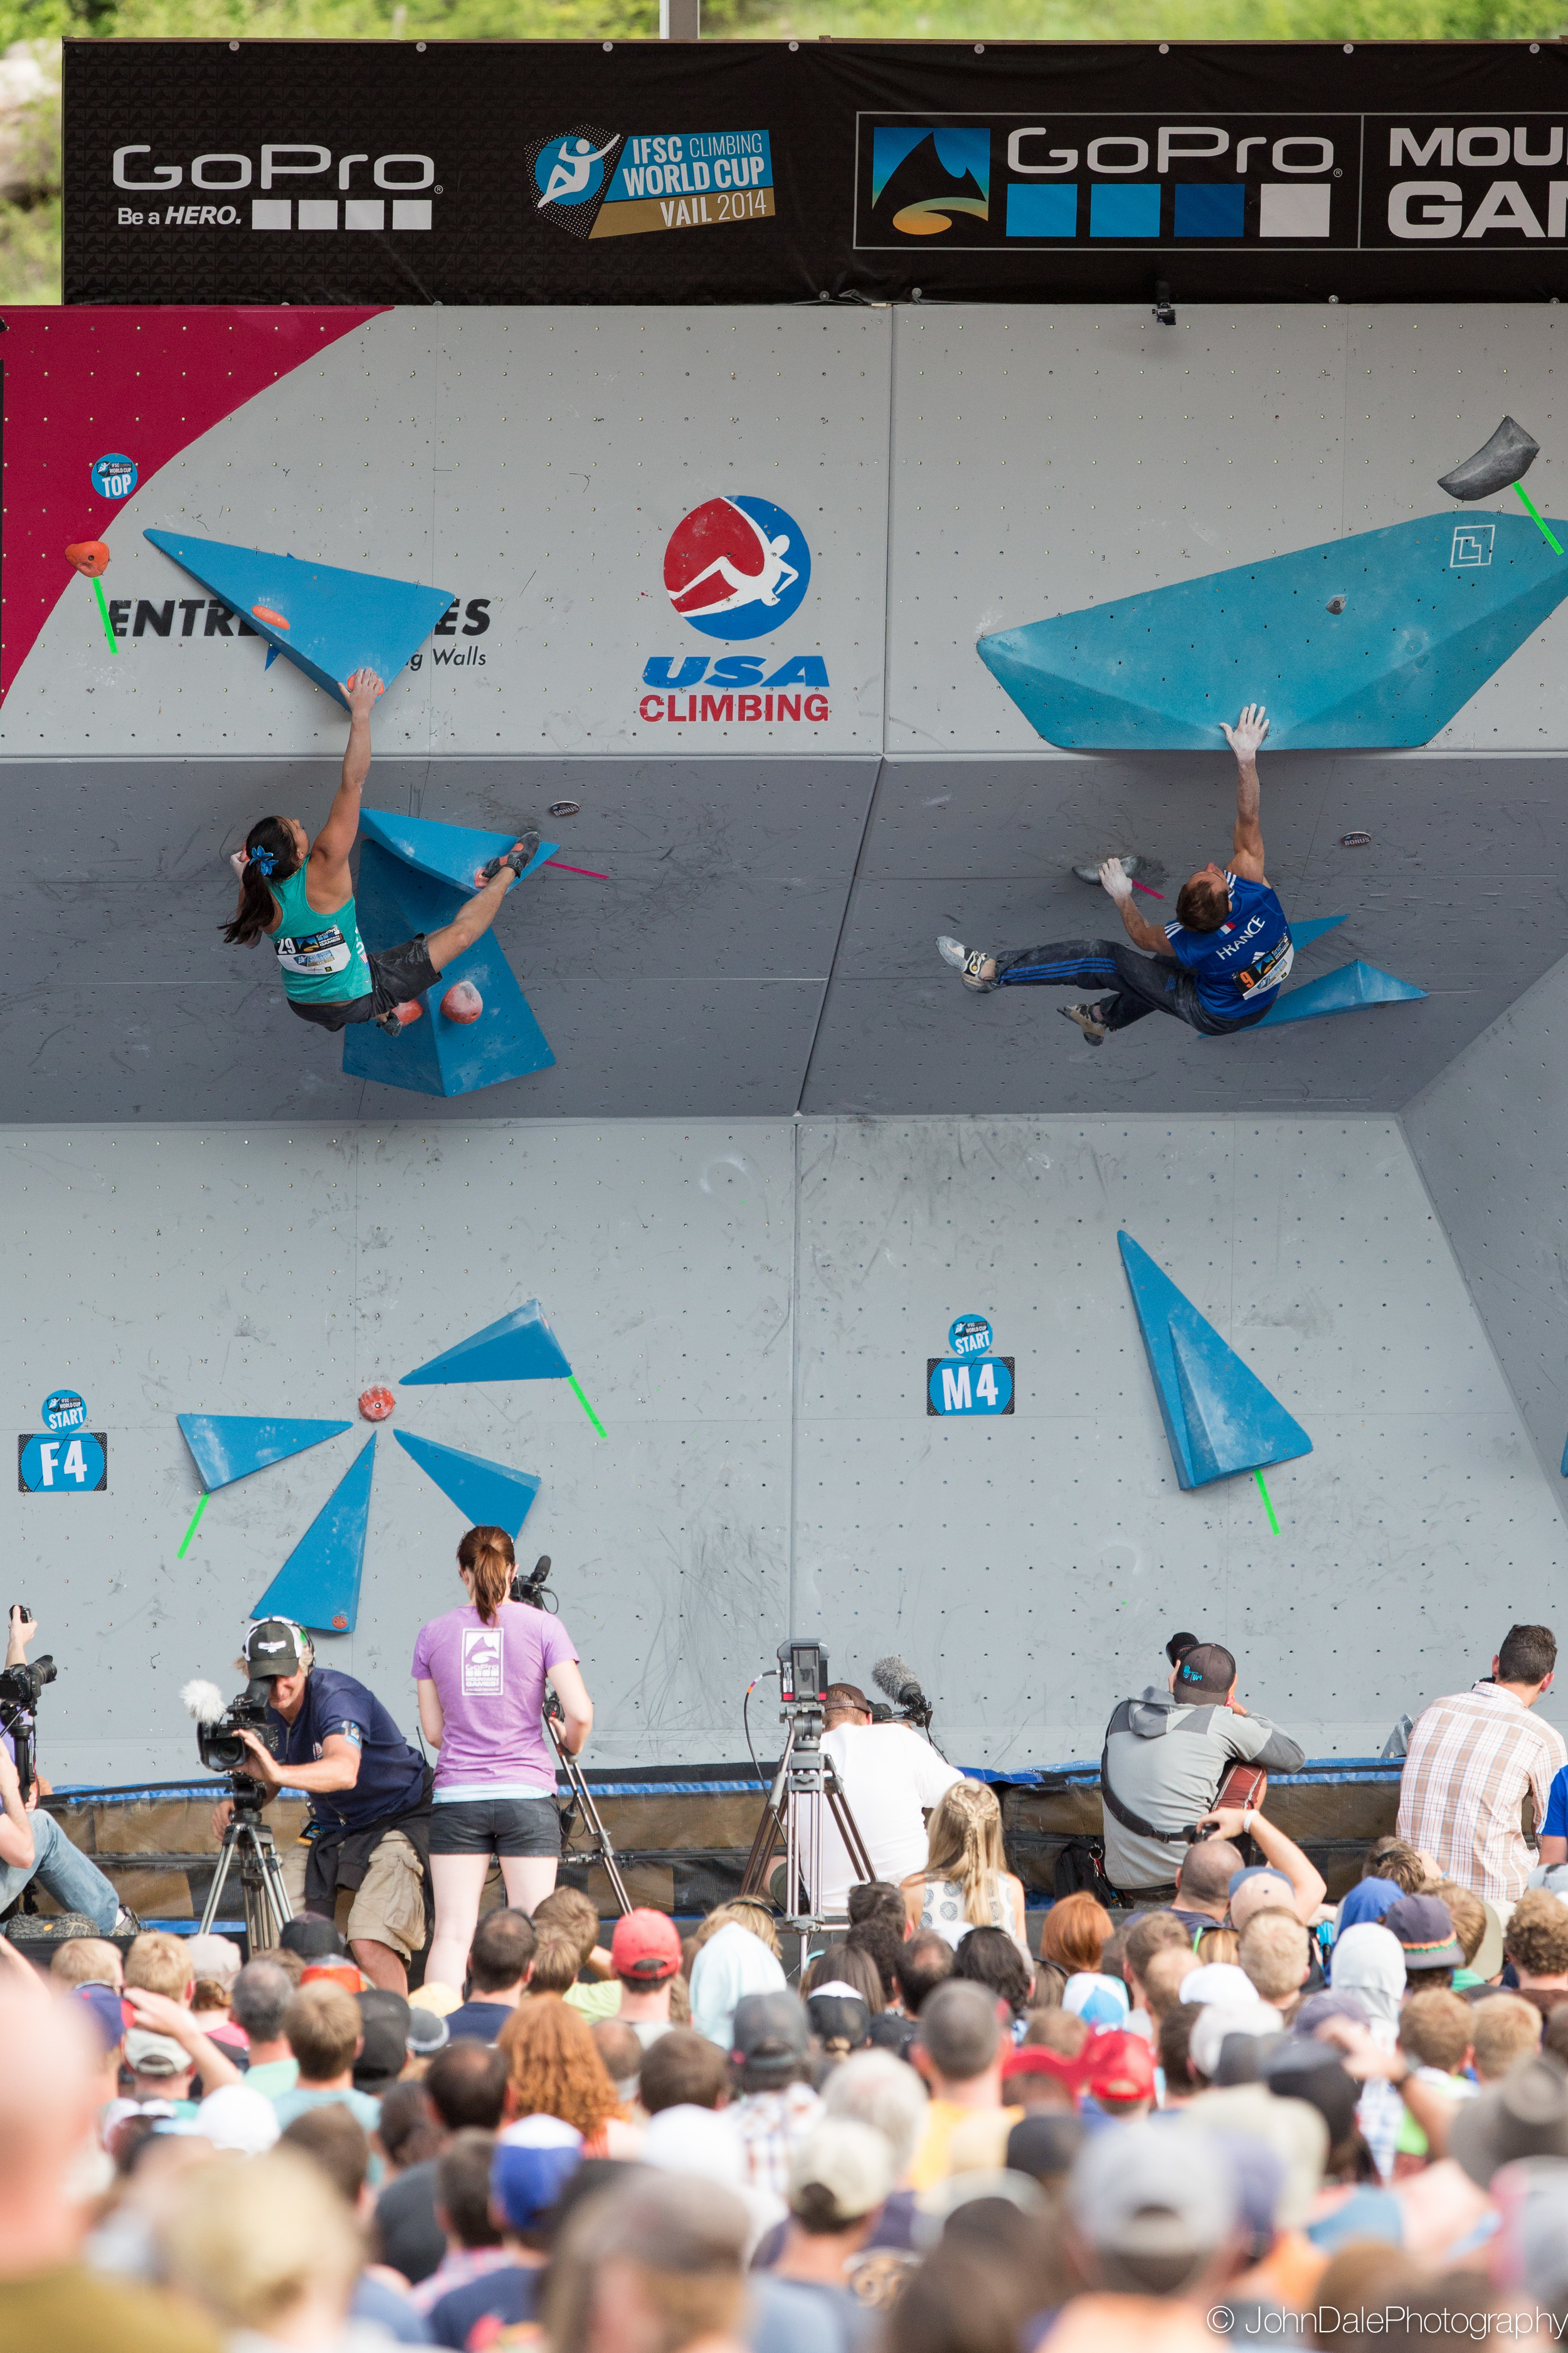 Climbing at the 2014 GoPro Mountain Games-16.jpg